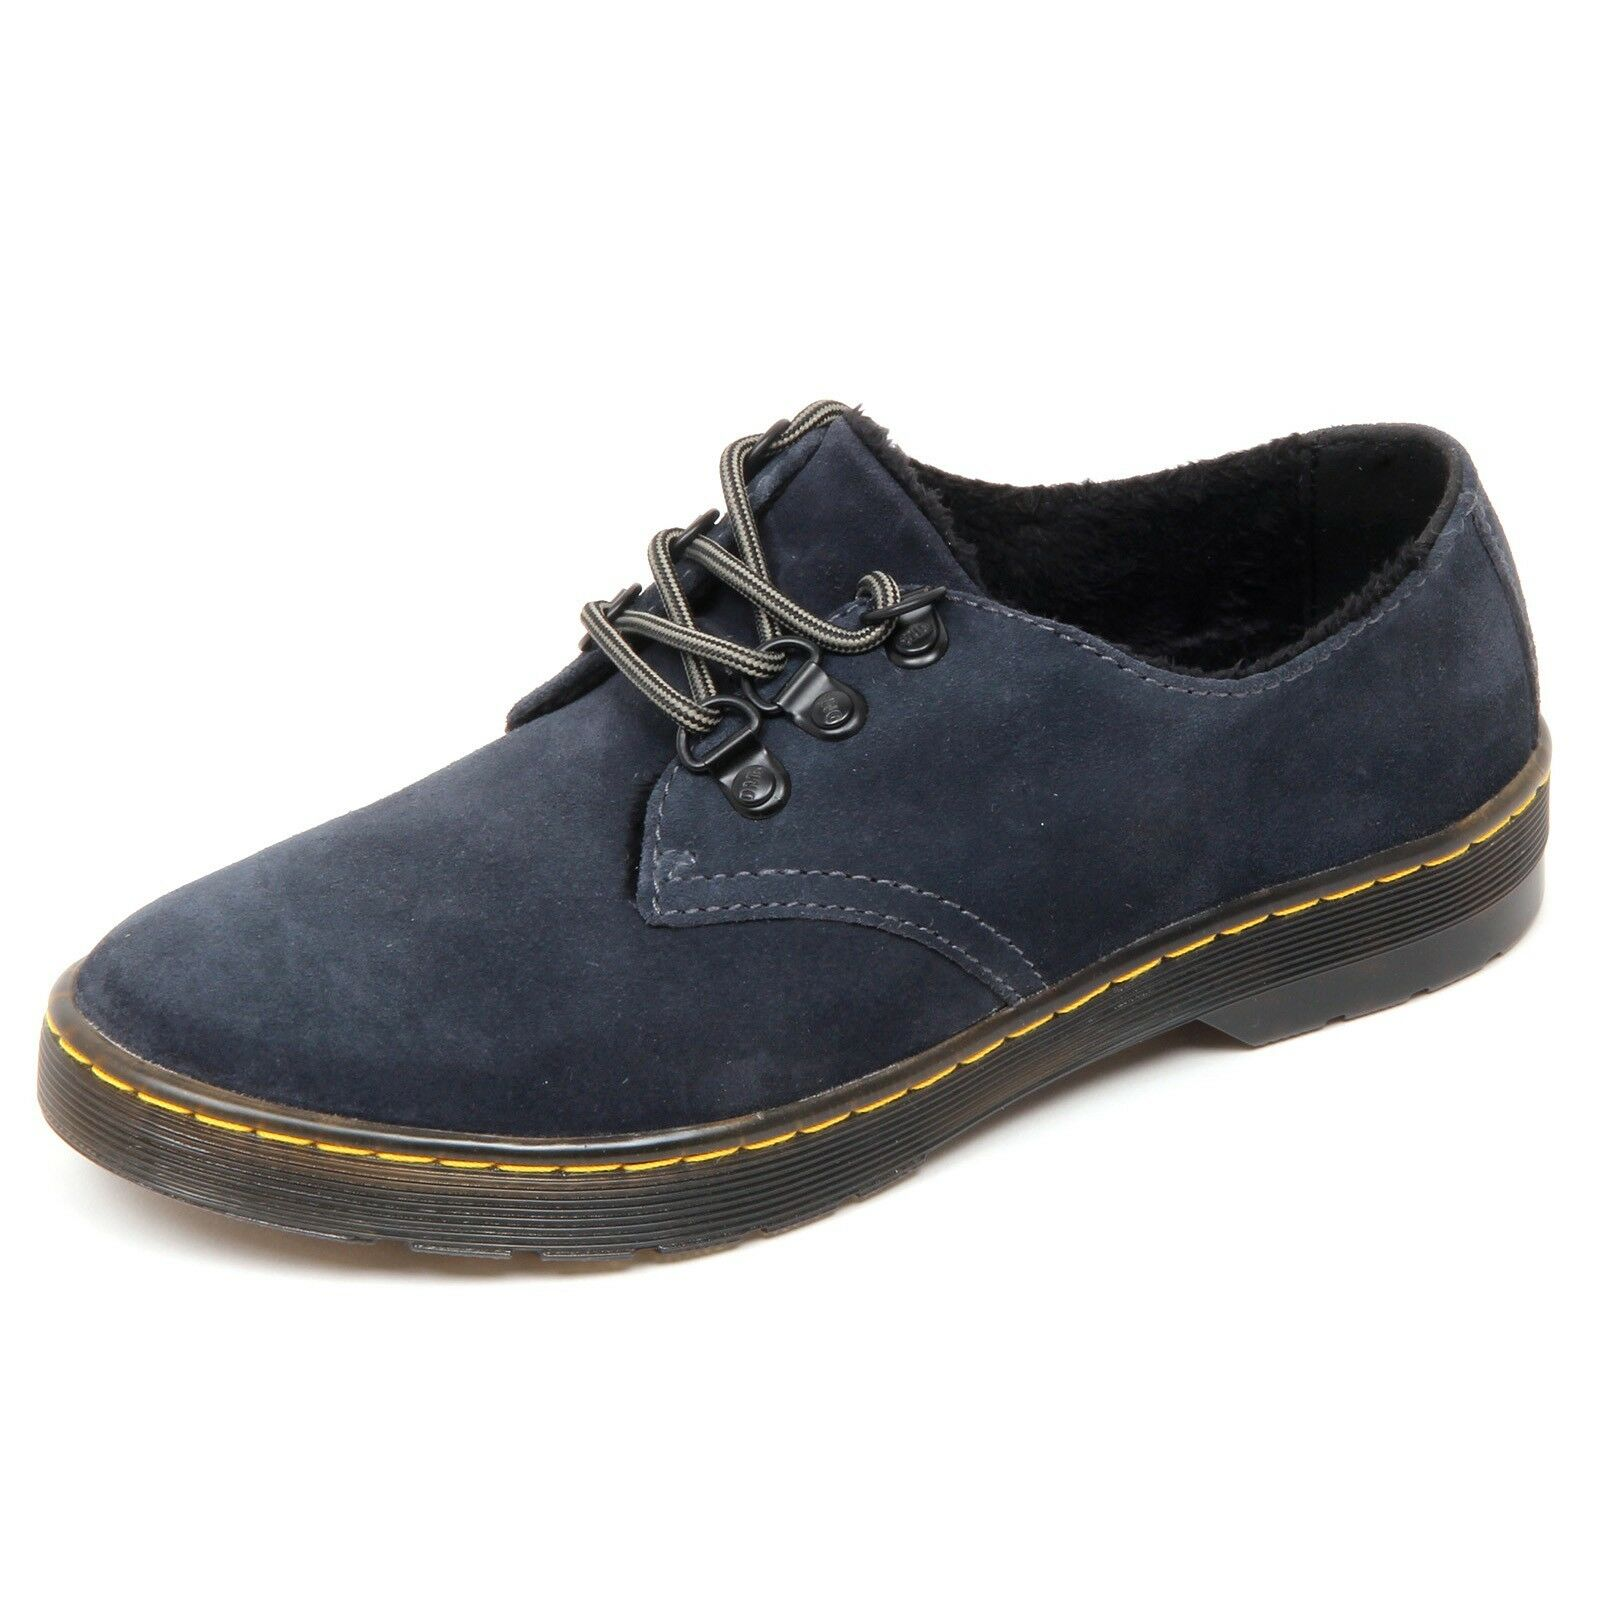 D1718 scarpa femme DR. MARTENS GIZELLE II grigio/blu chaussures grigio/blu II Chaussure  woman da25e5